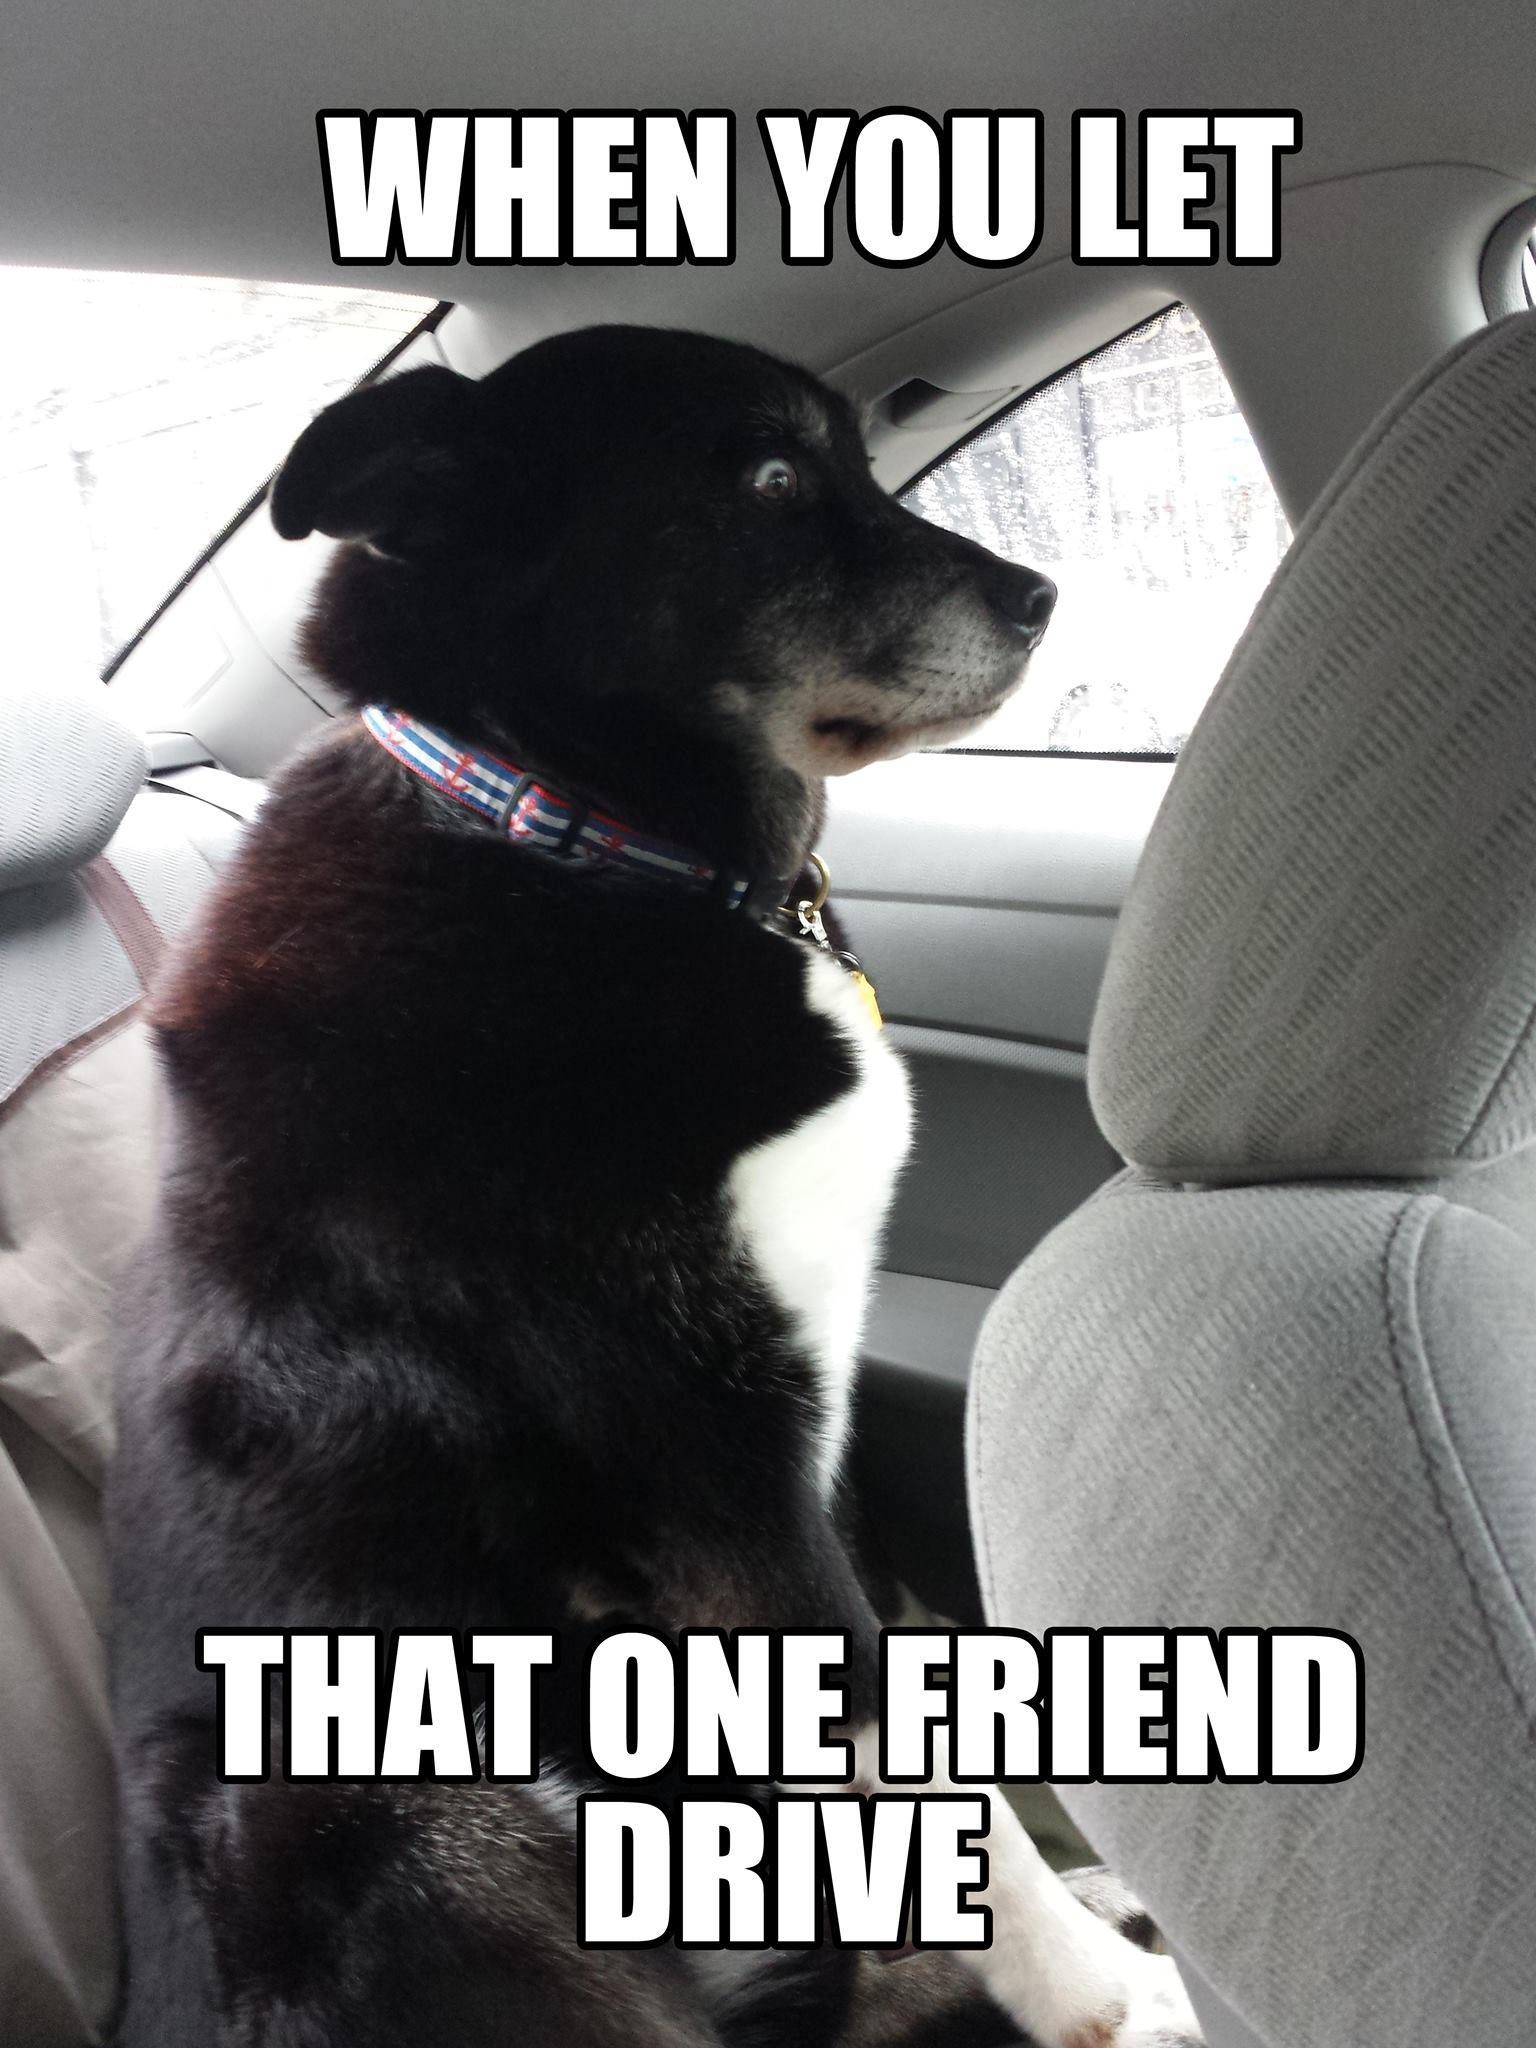 #Tag That #Friend D